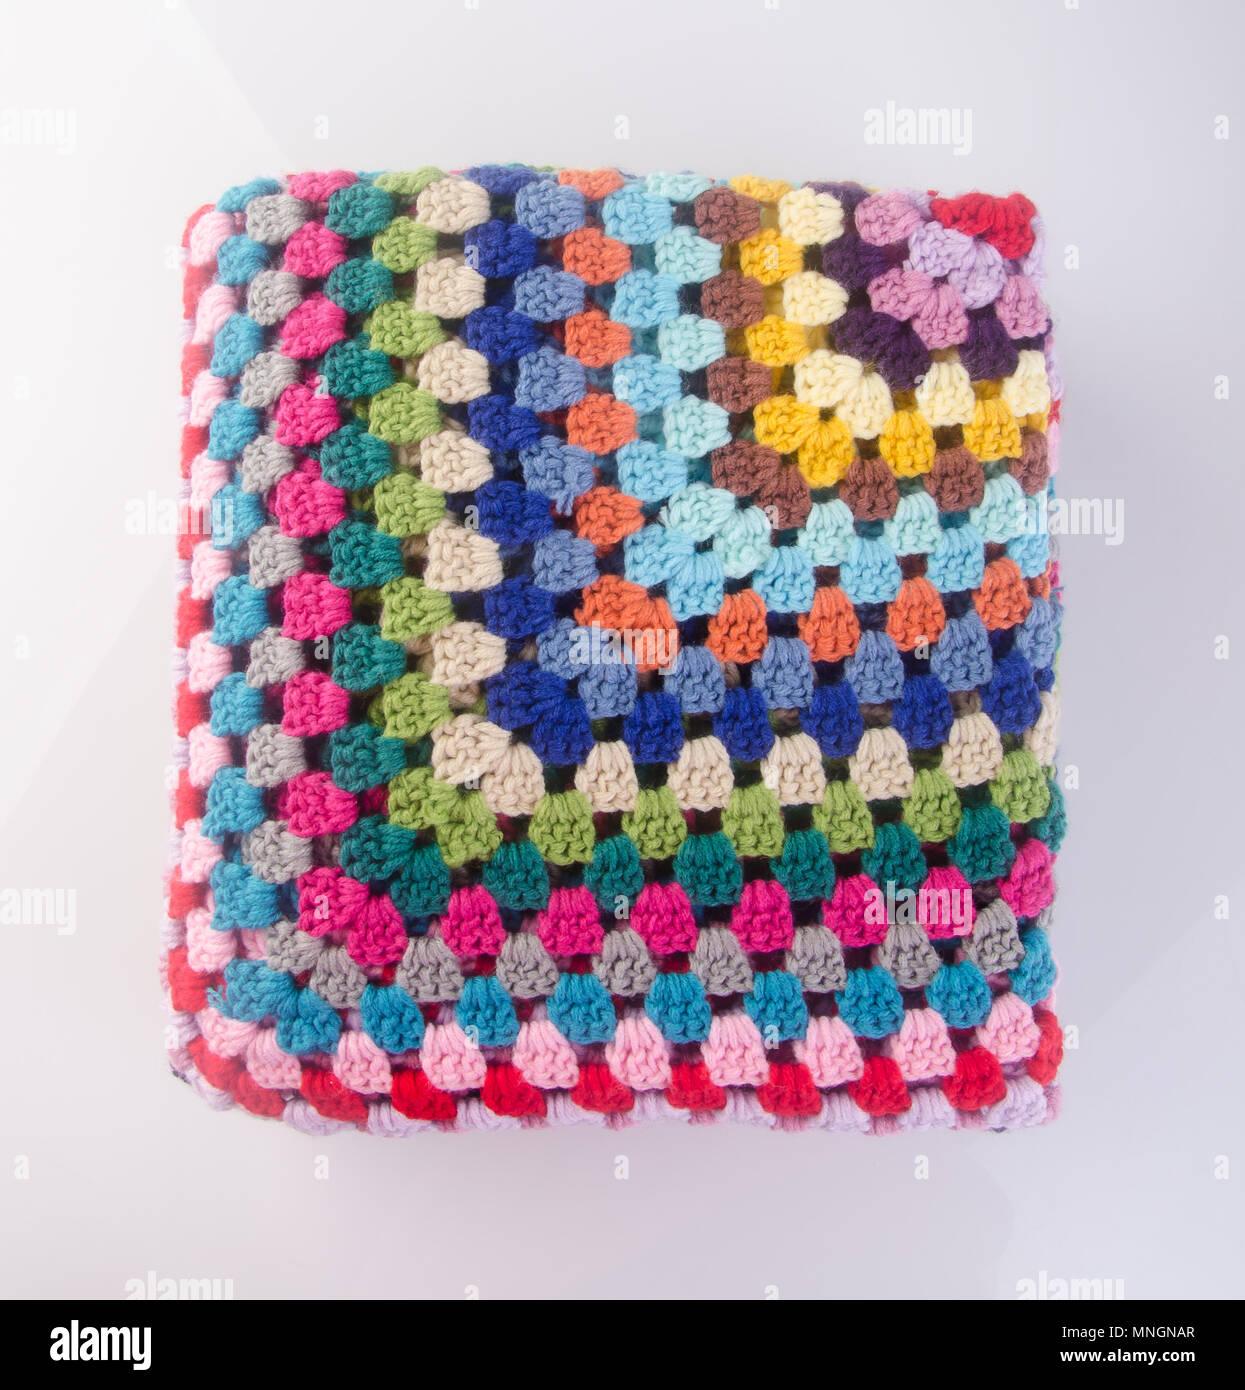 blanket or crochet blanket on a background MNGNAR